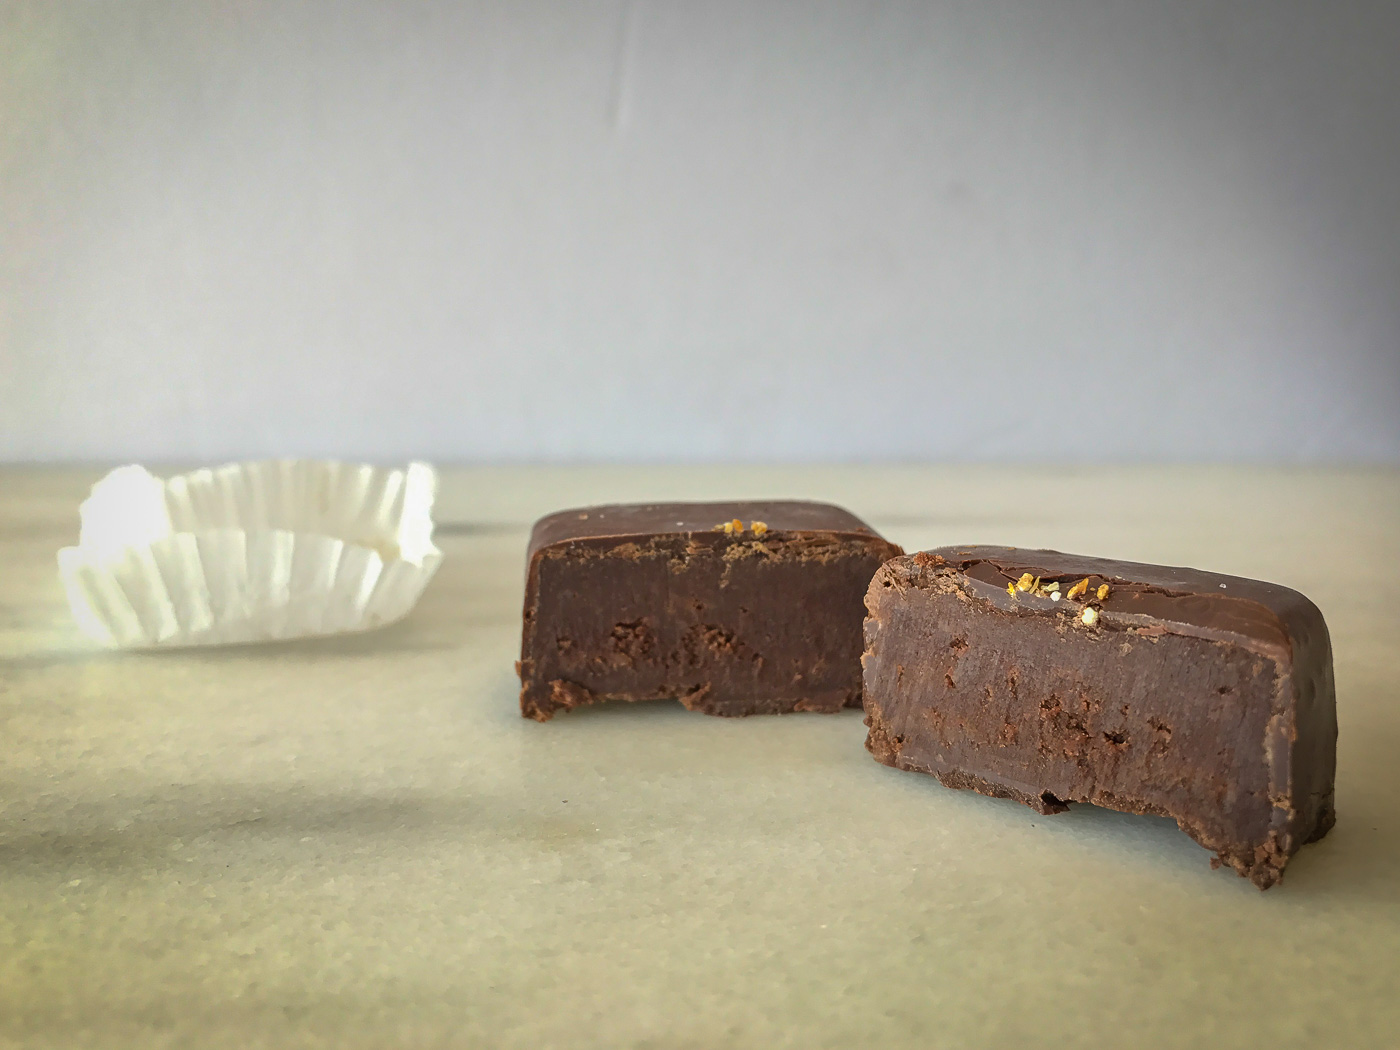 Missionary Chocolate truffle